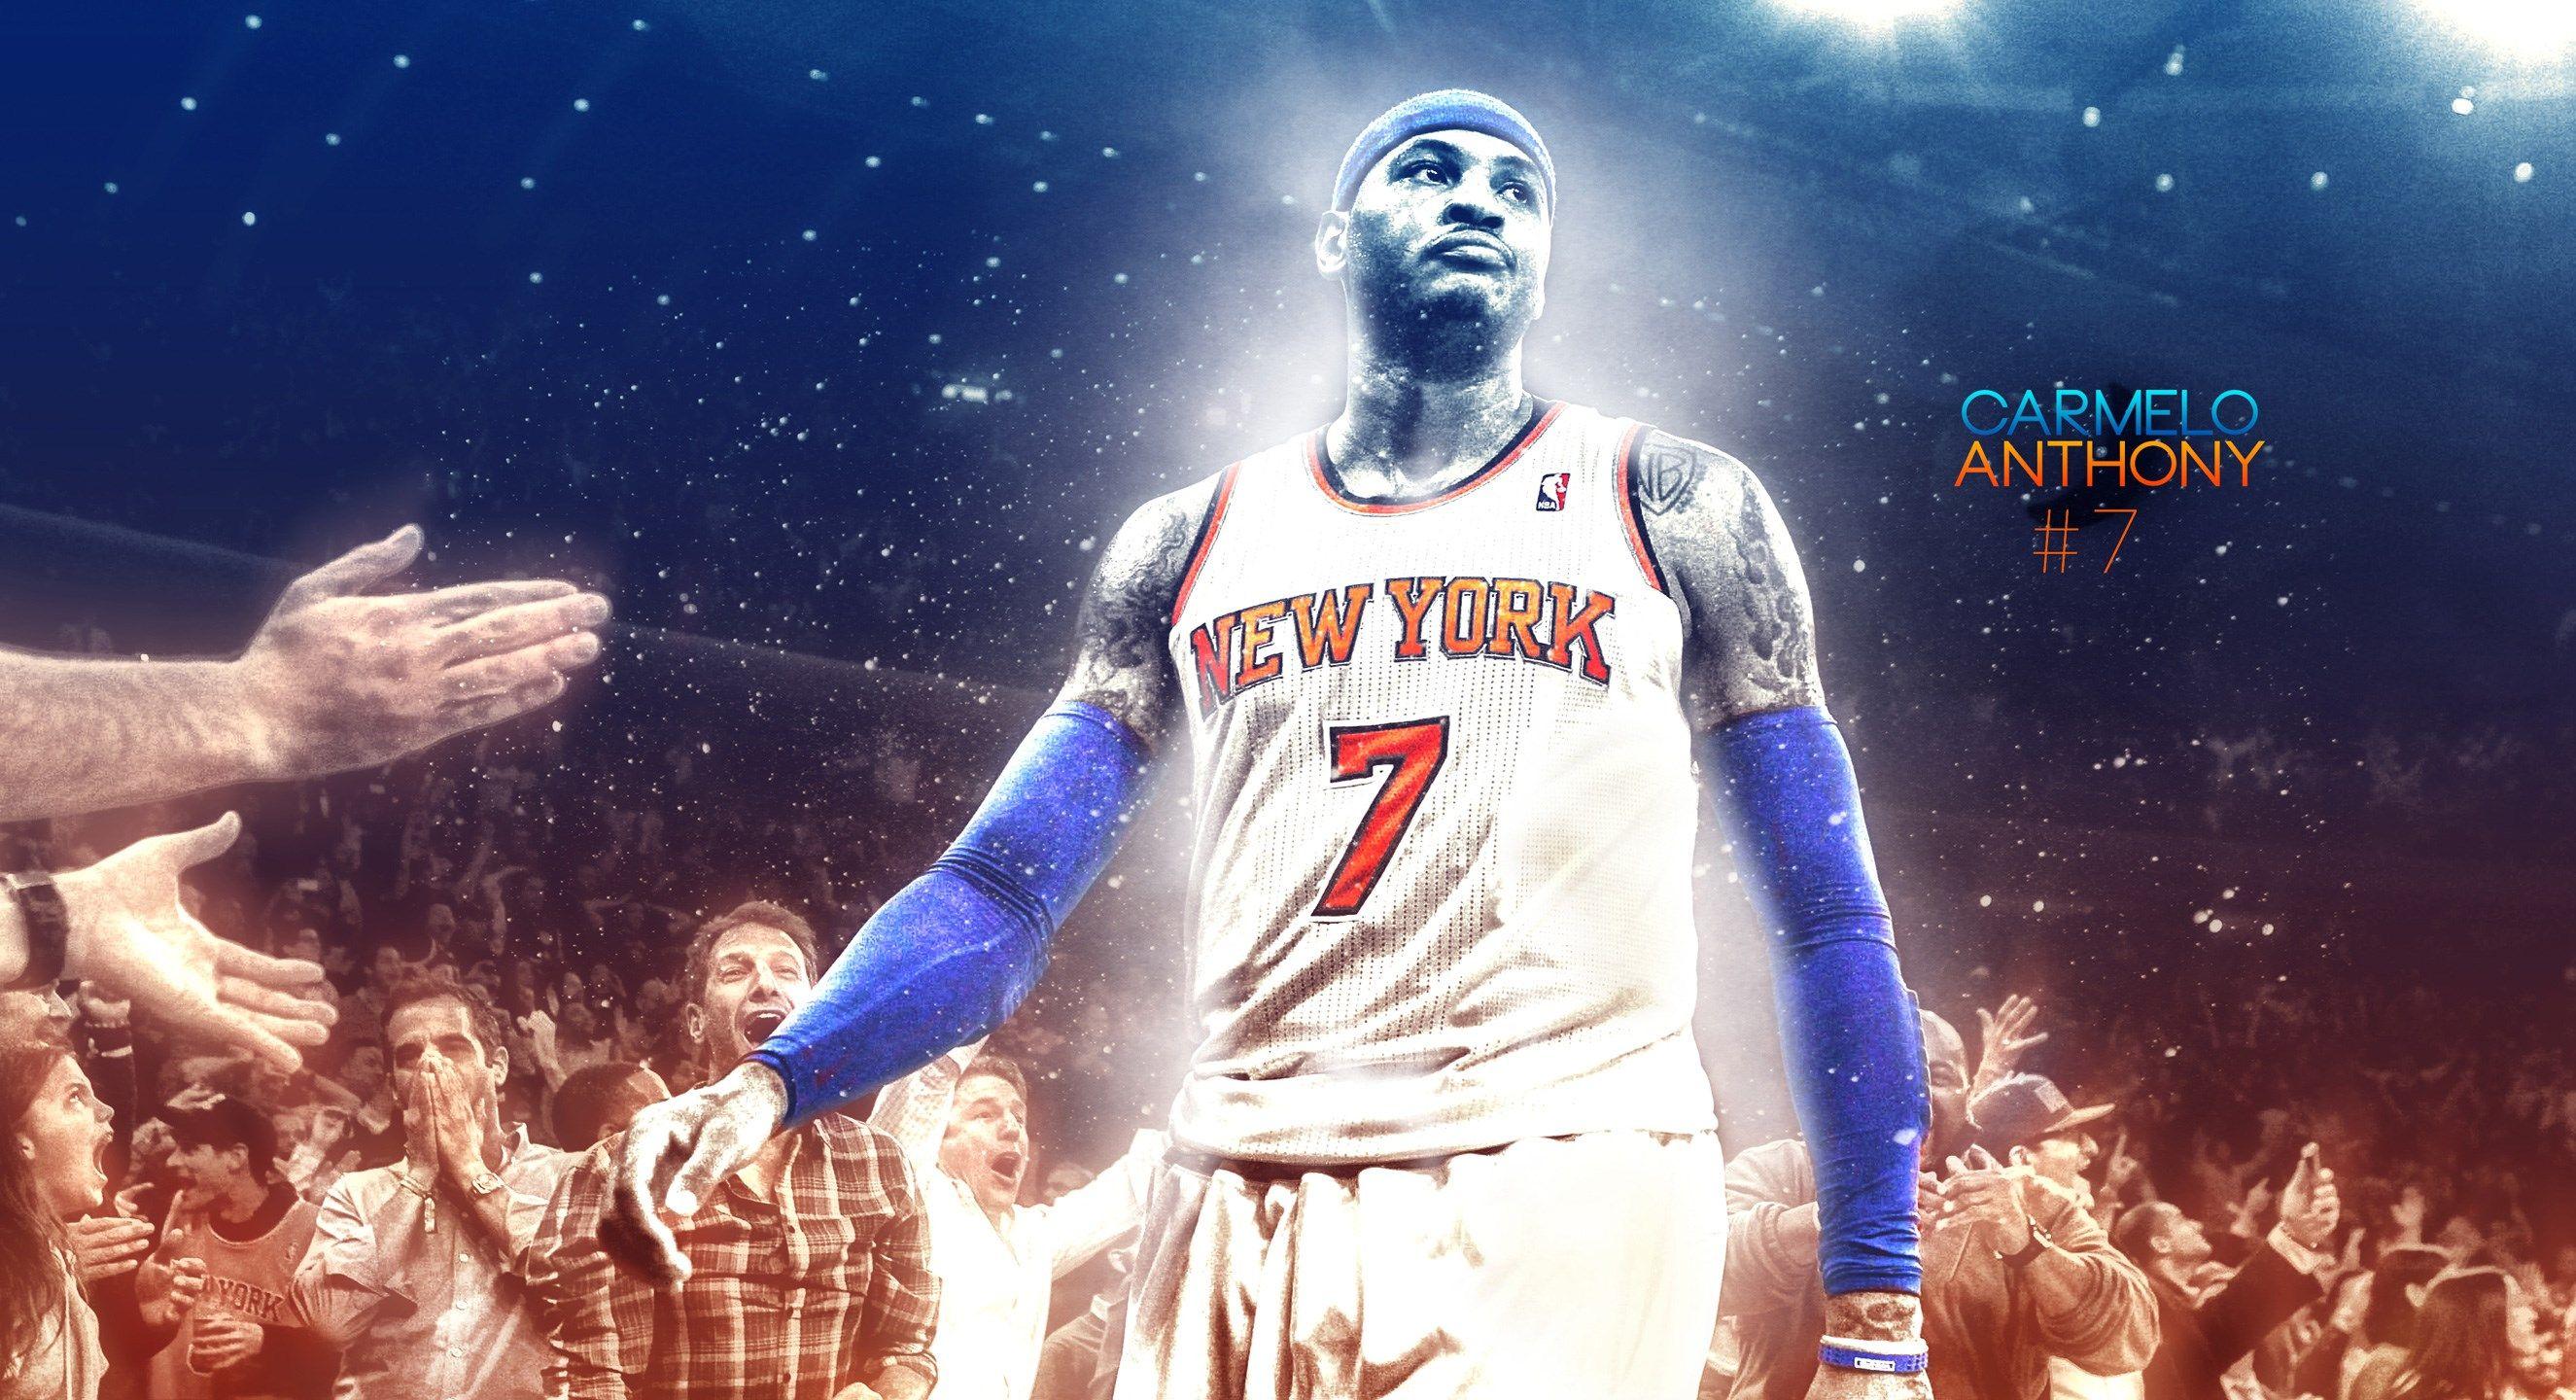 Carmelo Anthony New York Knicks Background Carmelo Anthony Anthony Carmelo Anthony Wallpaper